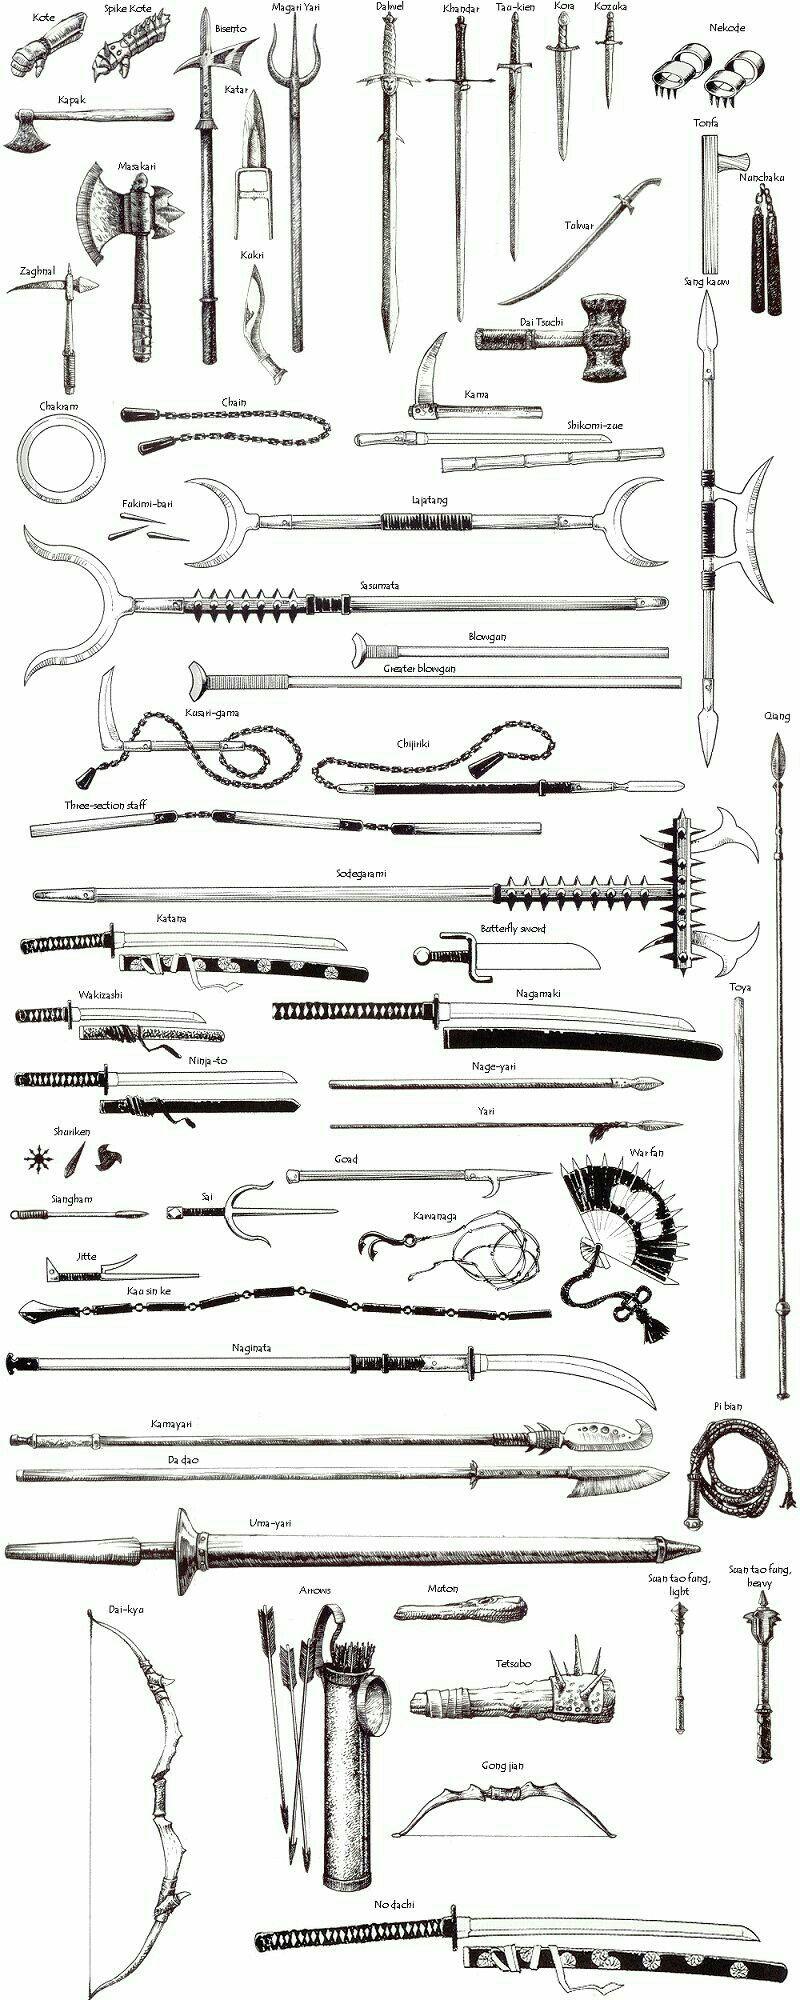 16 best images about Ninja Sword on Pinterest | The ...  |Types Of Ninja Swords